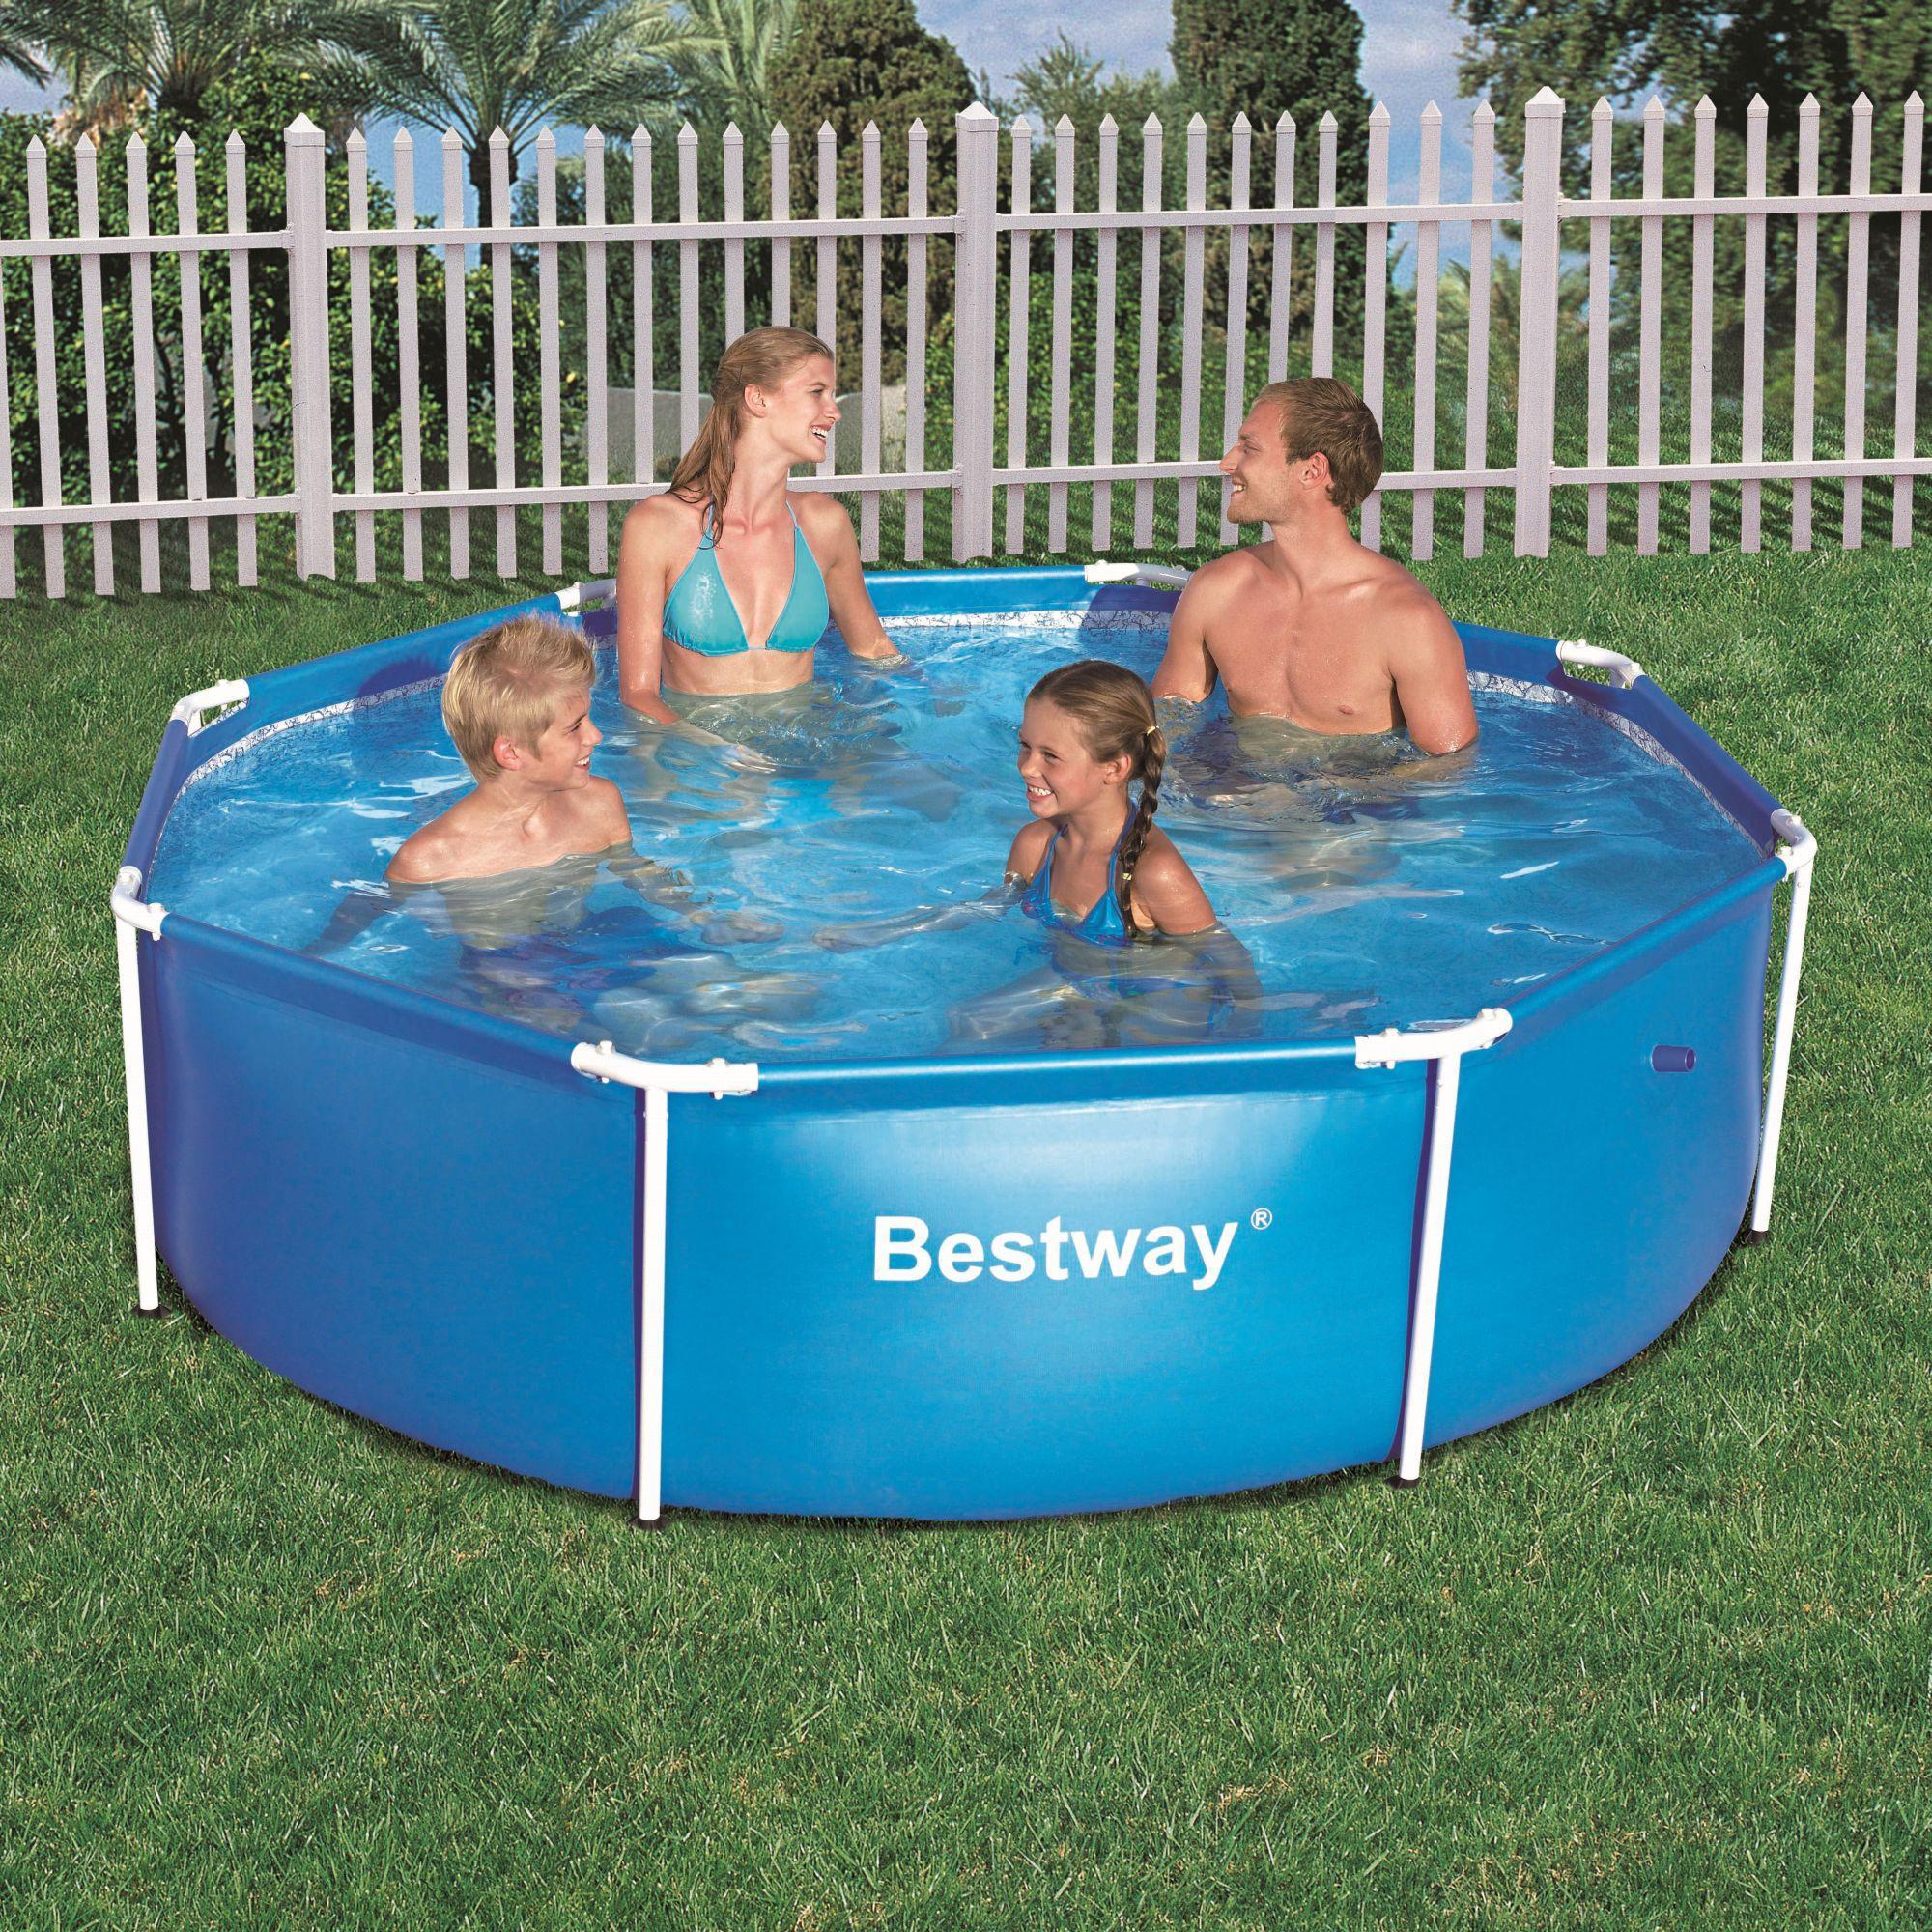 Foto piscina con depuradora de 366 x 76 cm bestway foto 586651 for Piscinas bestway catalogo